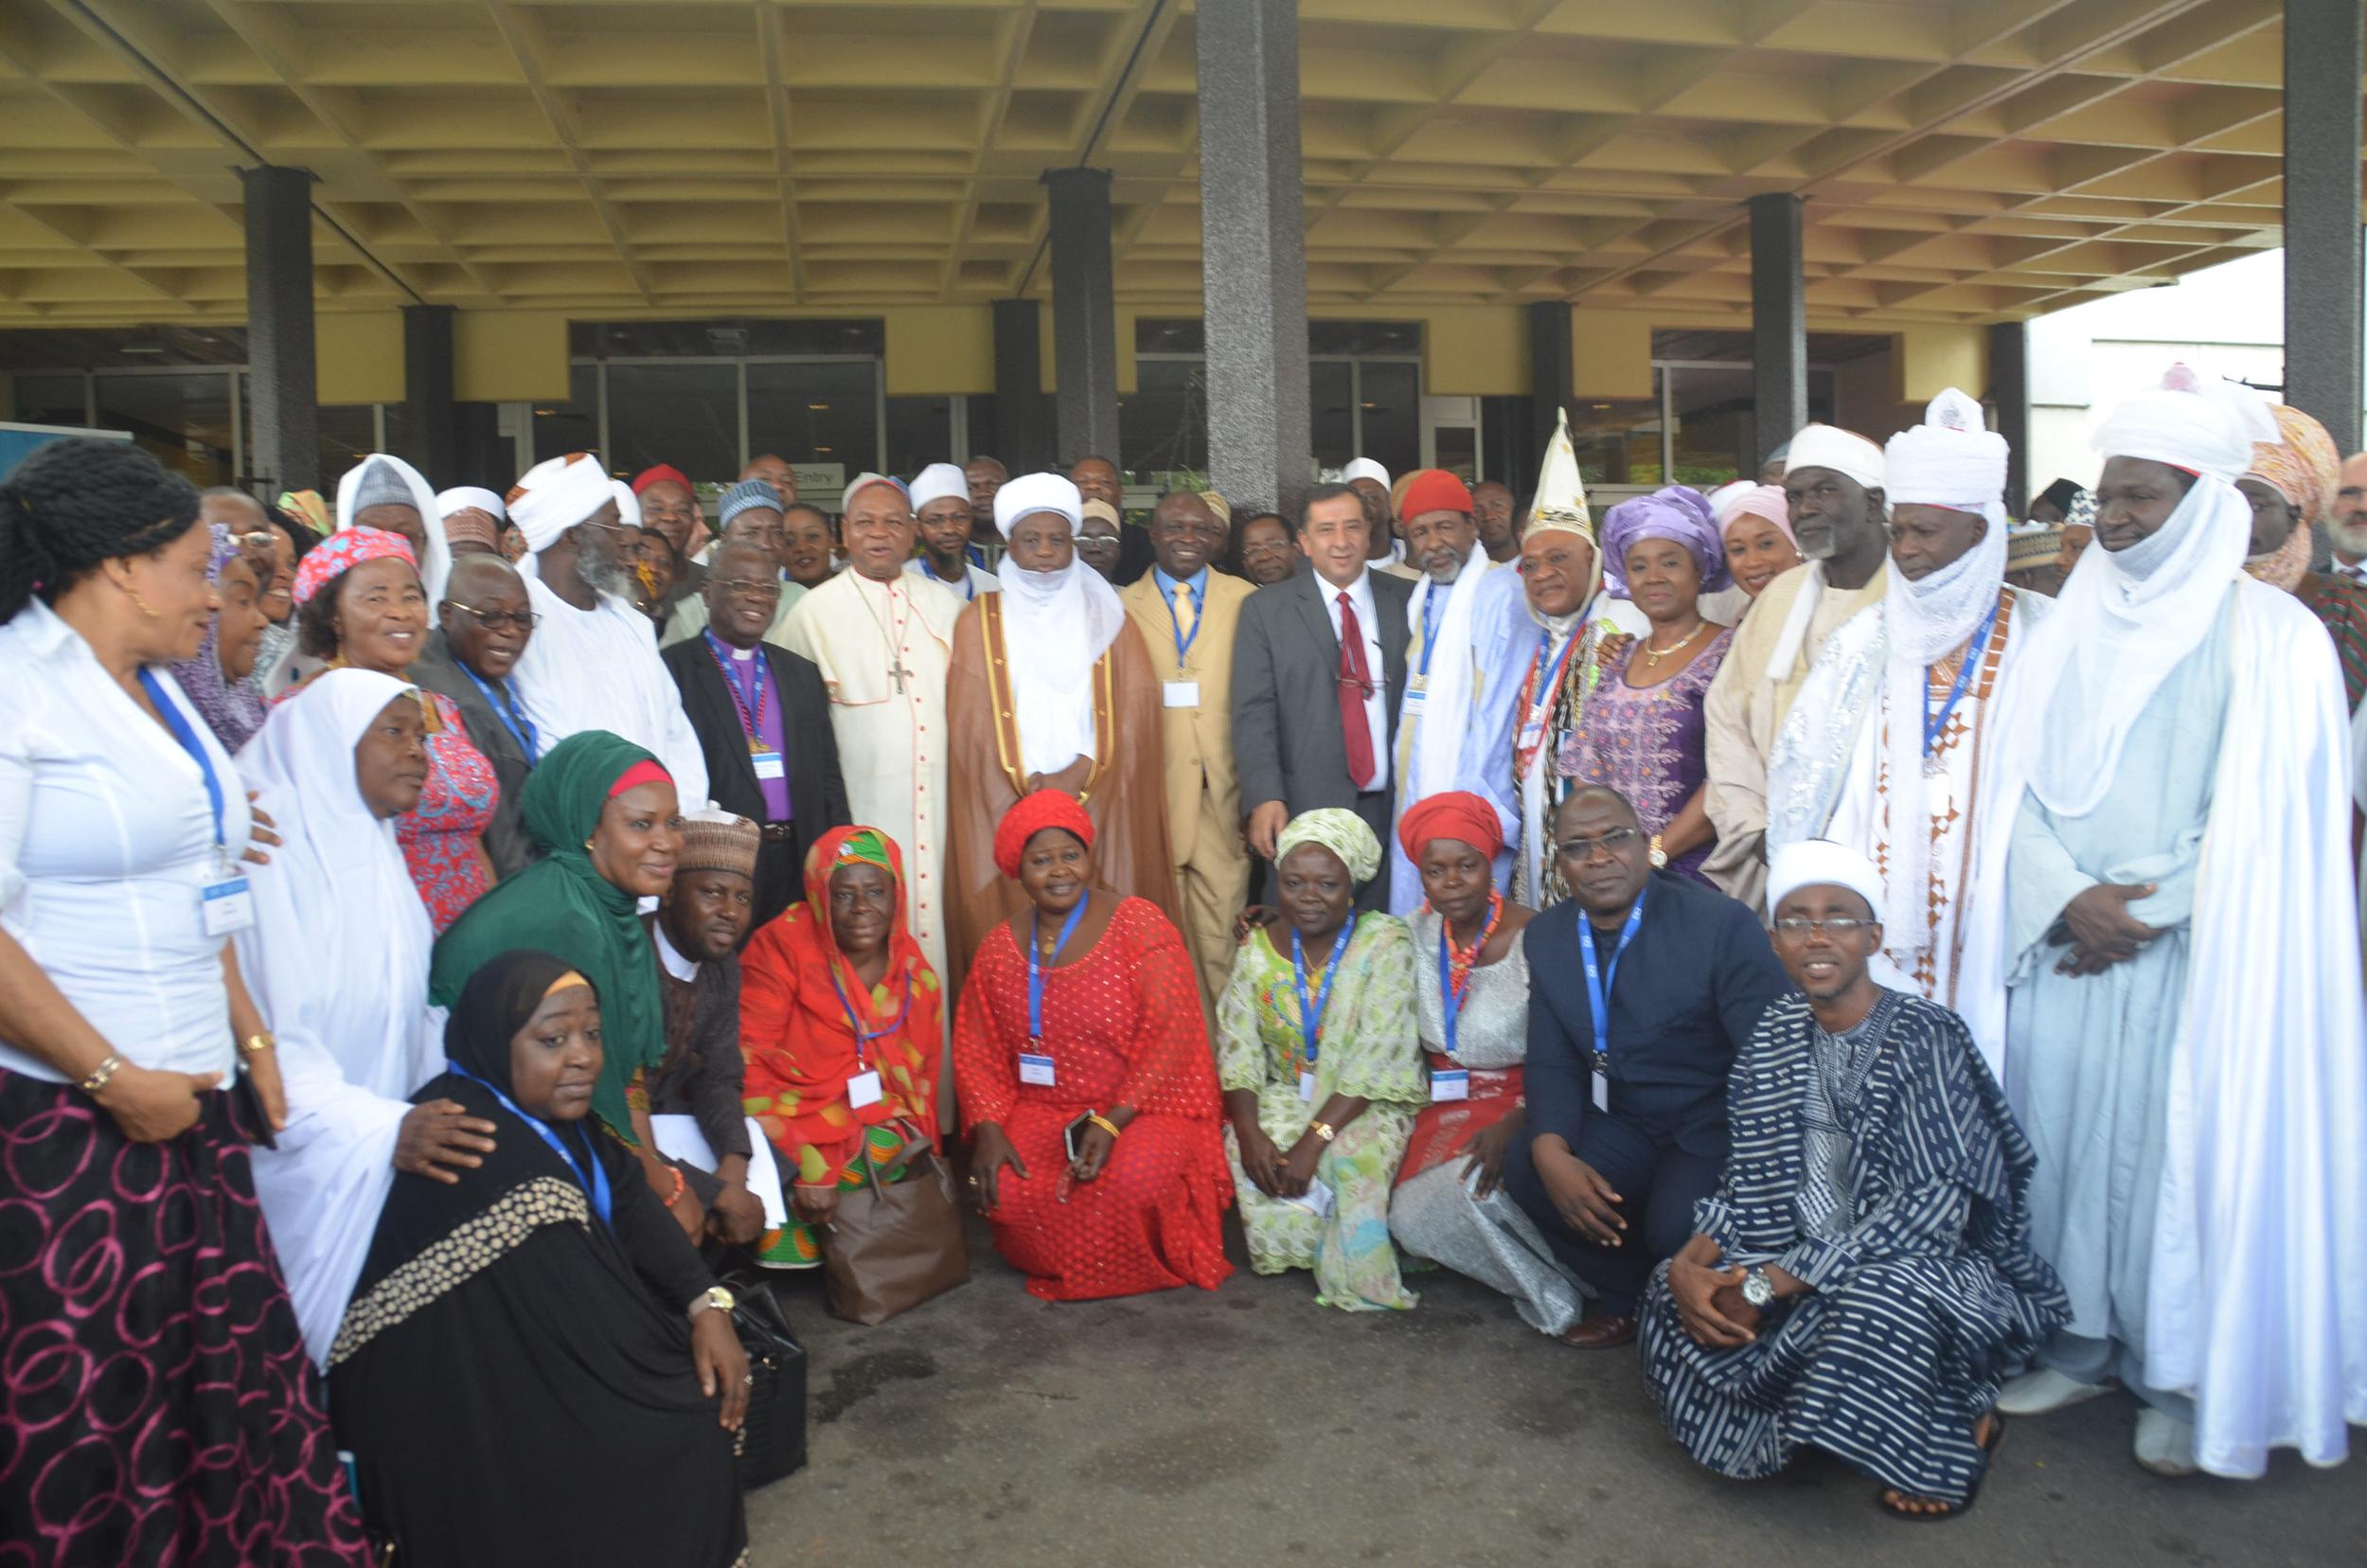 Summit on Interreligious Understanding in Nigeria